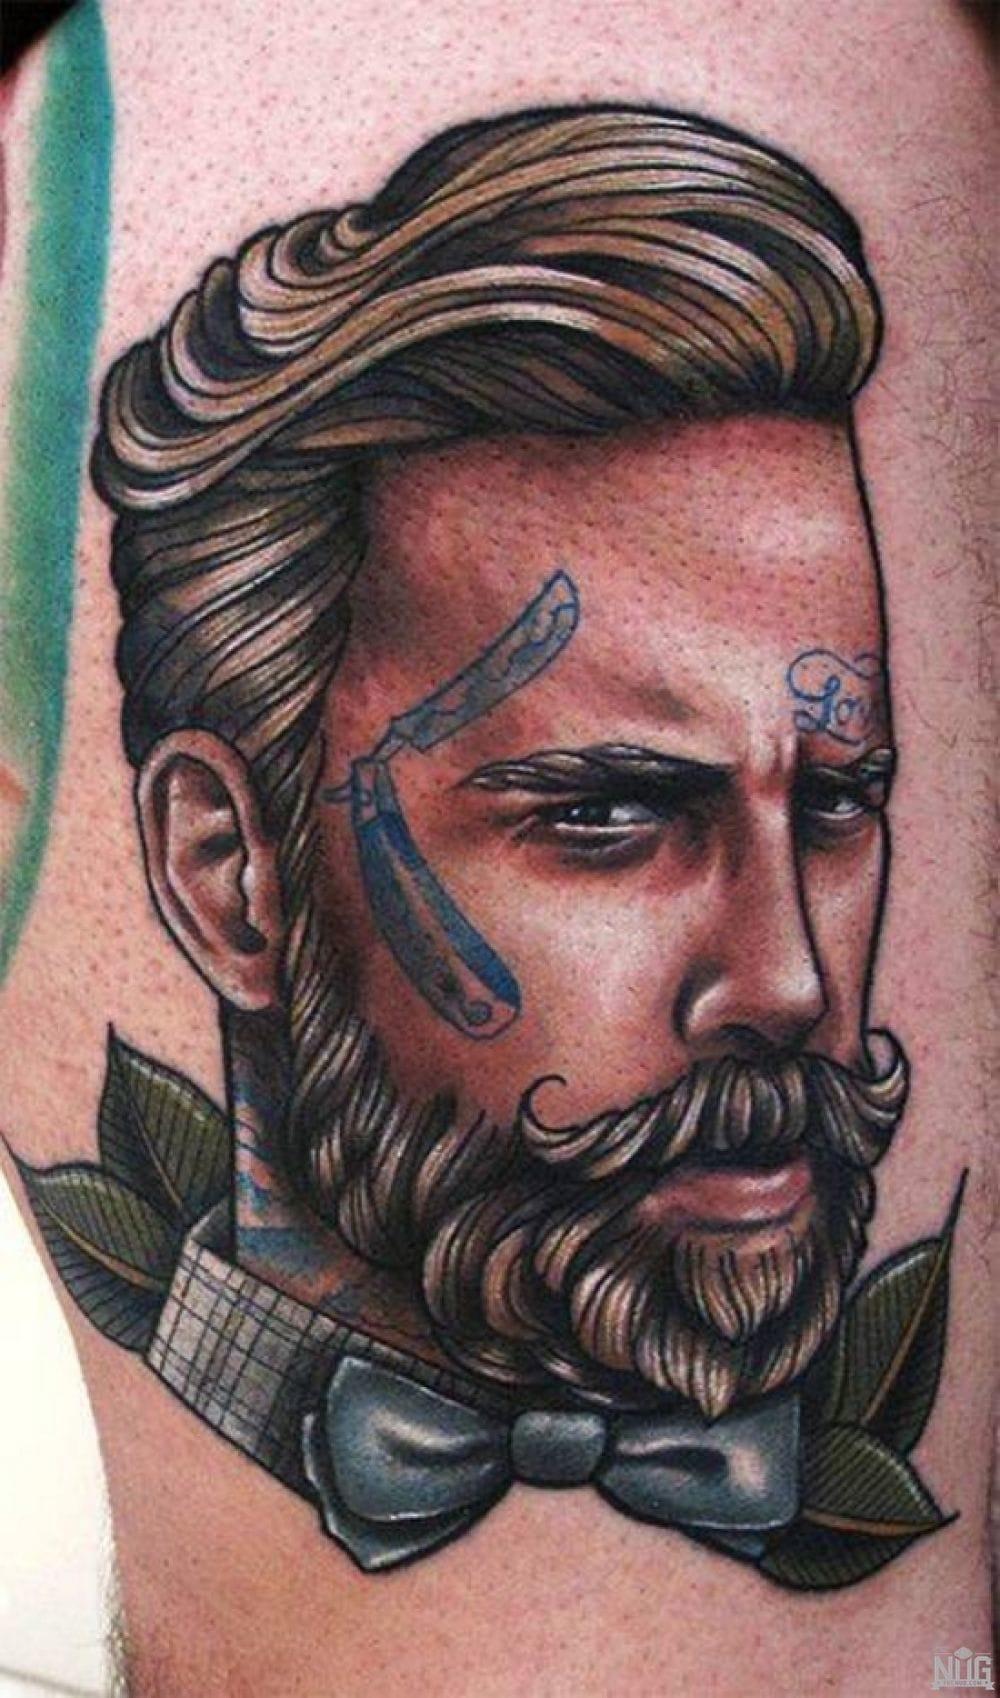 tattooed bearded lad by Roza from Greece